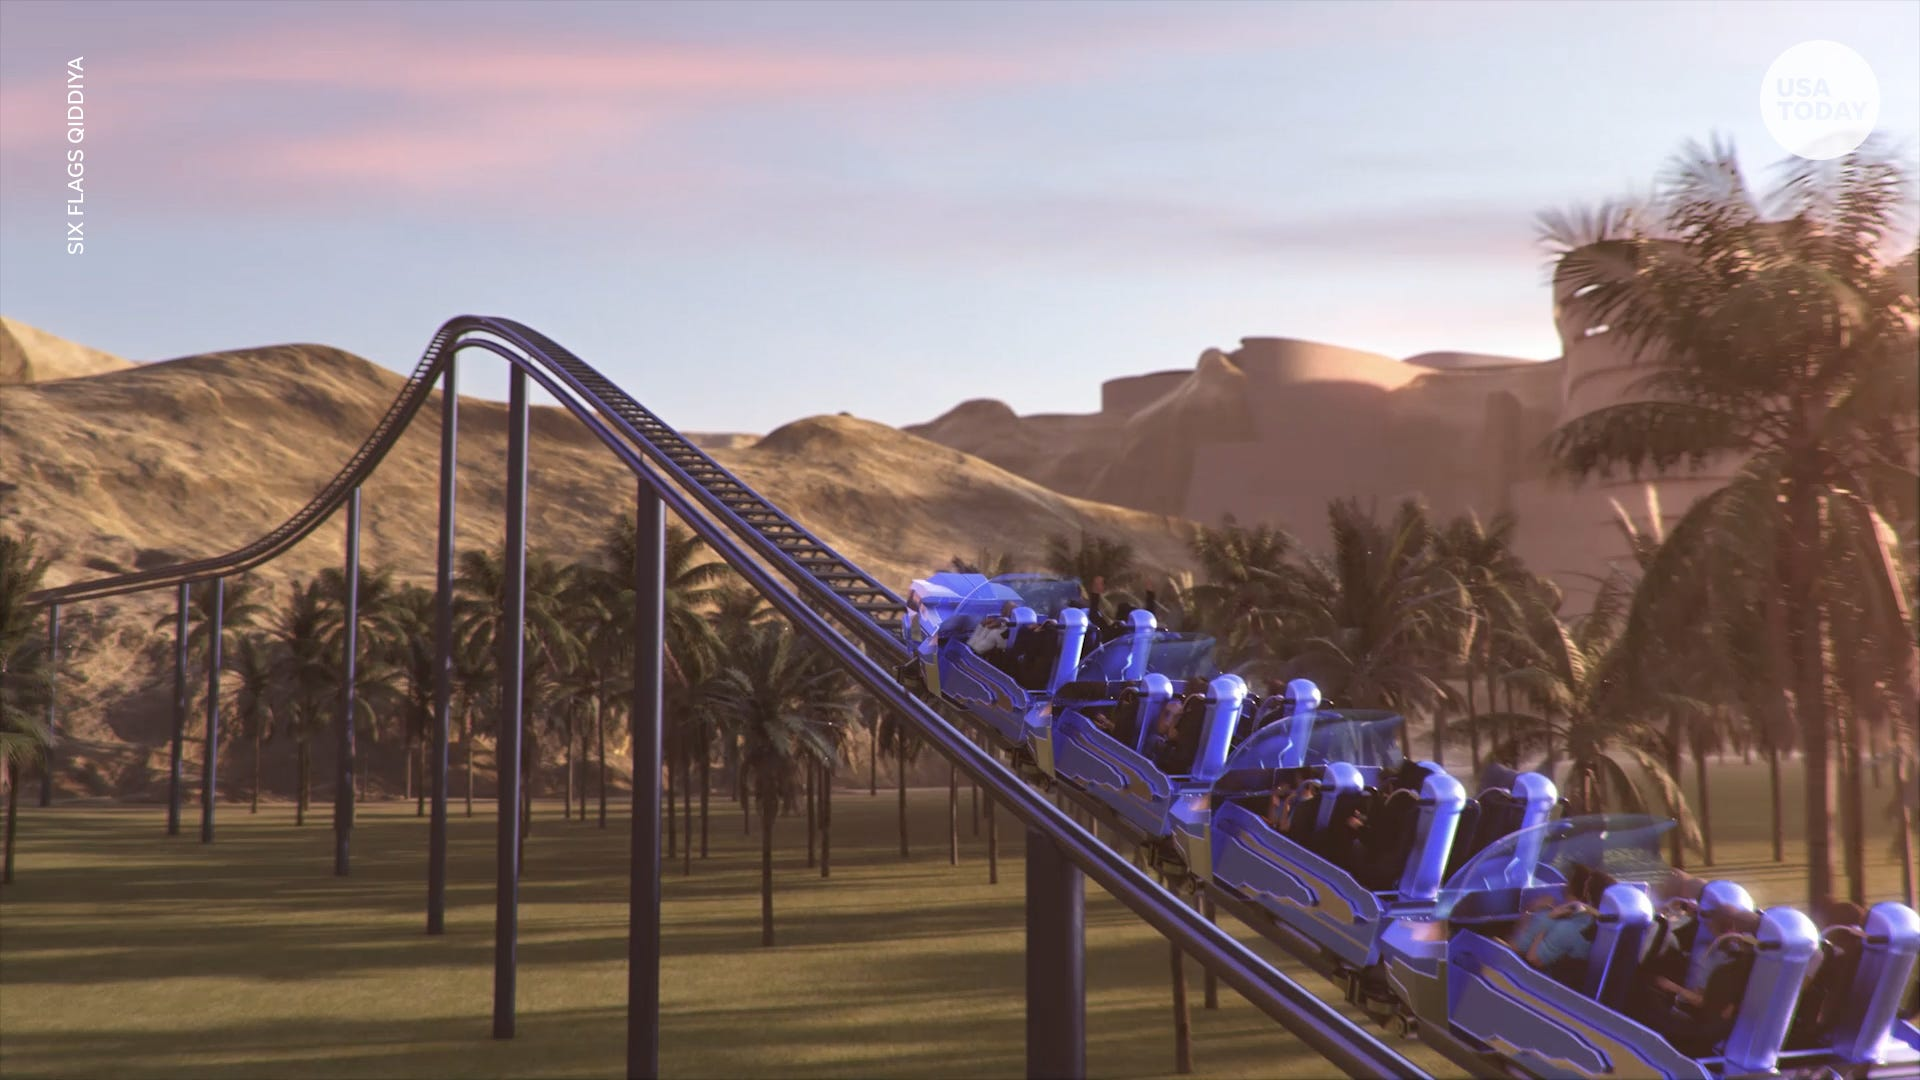 Falcon's Flight roller coaster to debut at Six Flags Qiddiya in Saudi Arabia in 2023